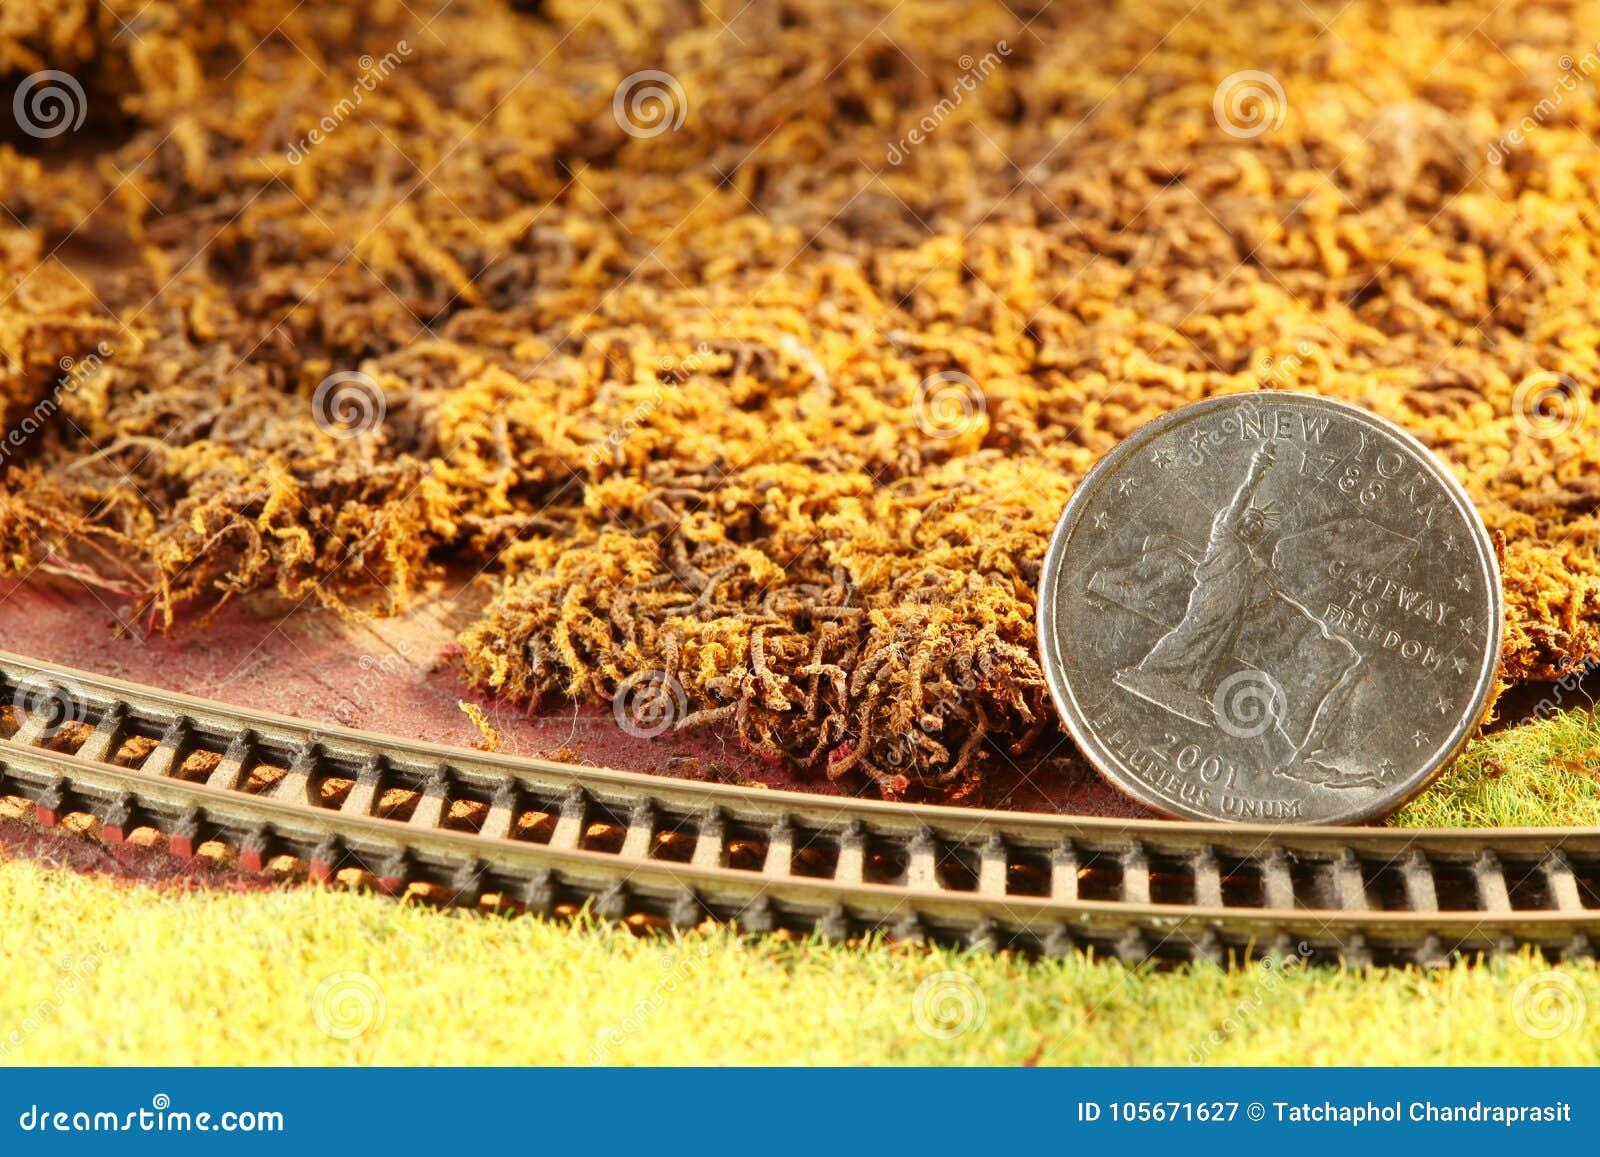 The money coin put on the miniature model railroad model scene.